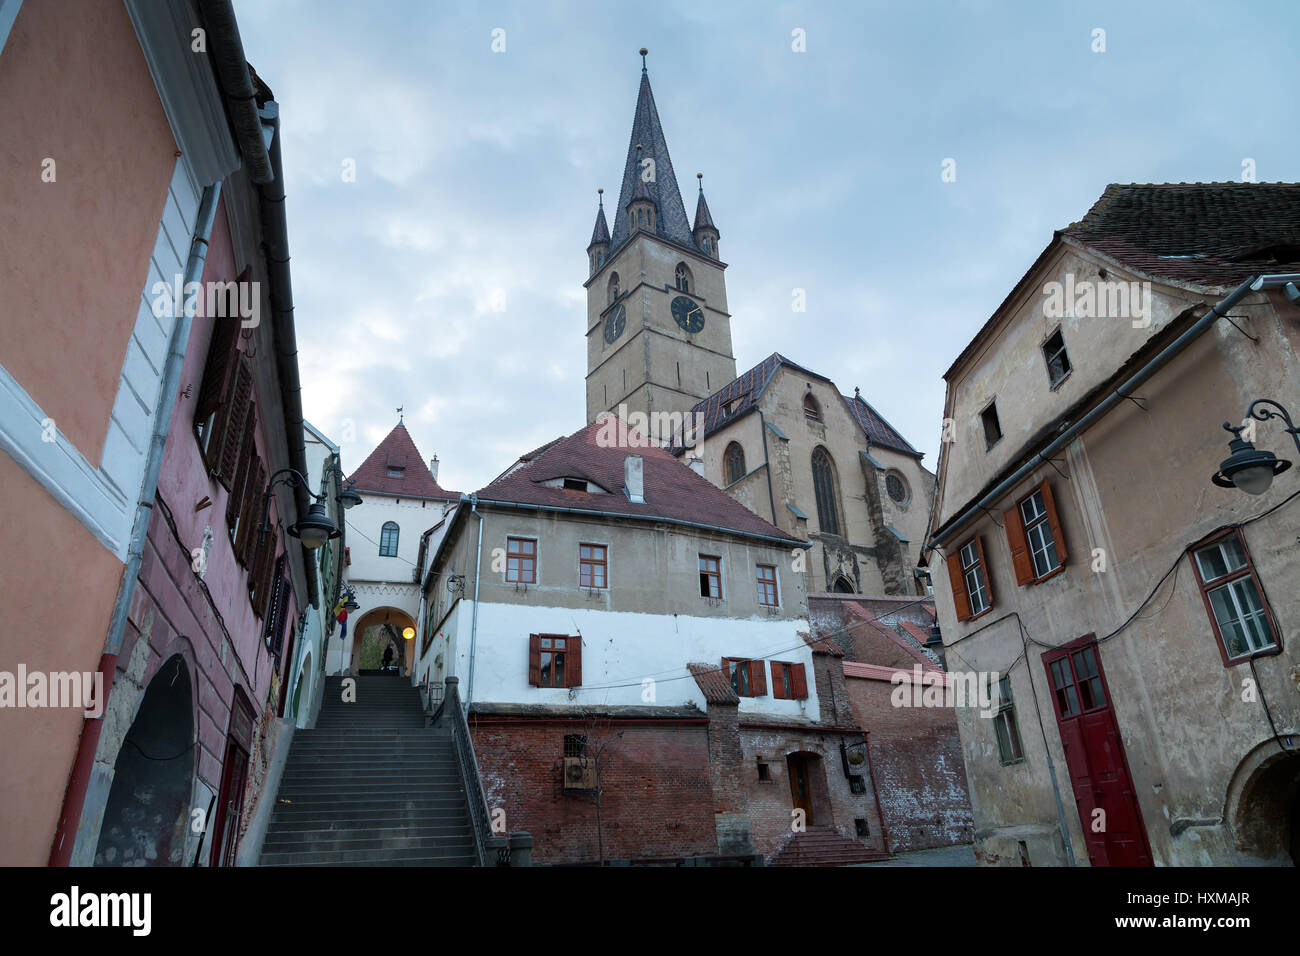 SIBIU ROMANIA, View of townsquare of Sibiu old town Romania - Stock Image